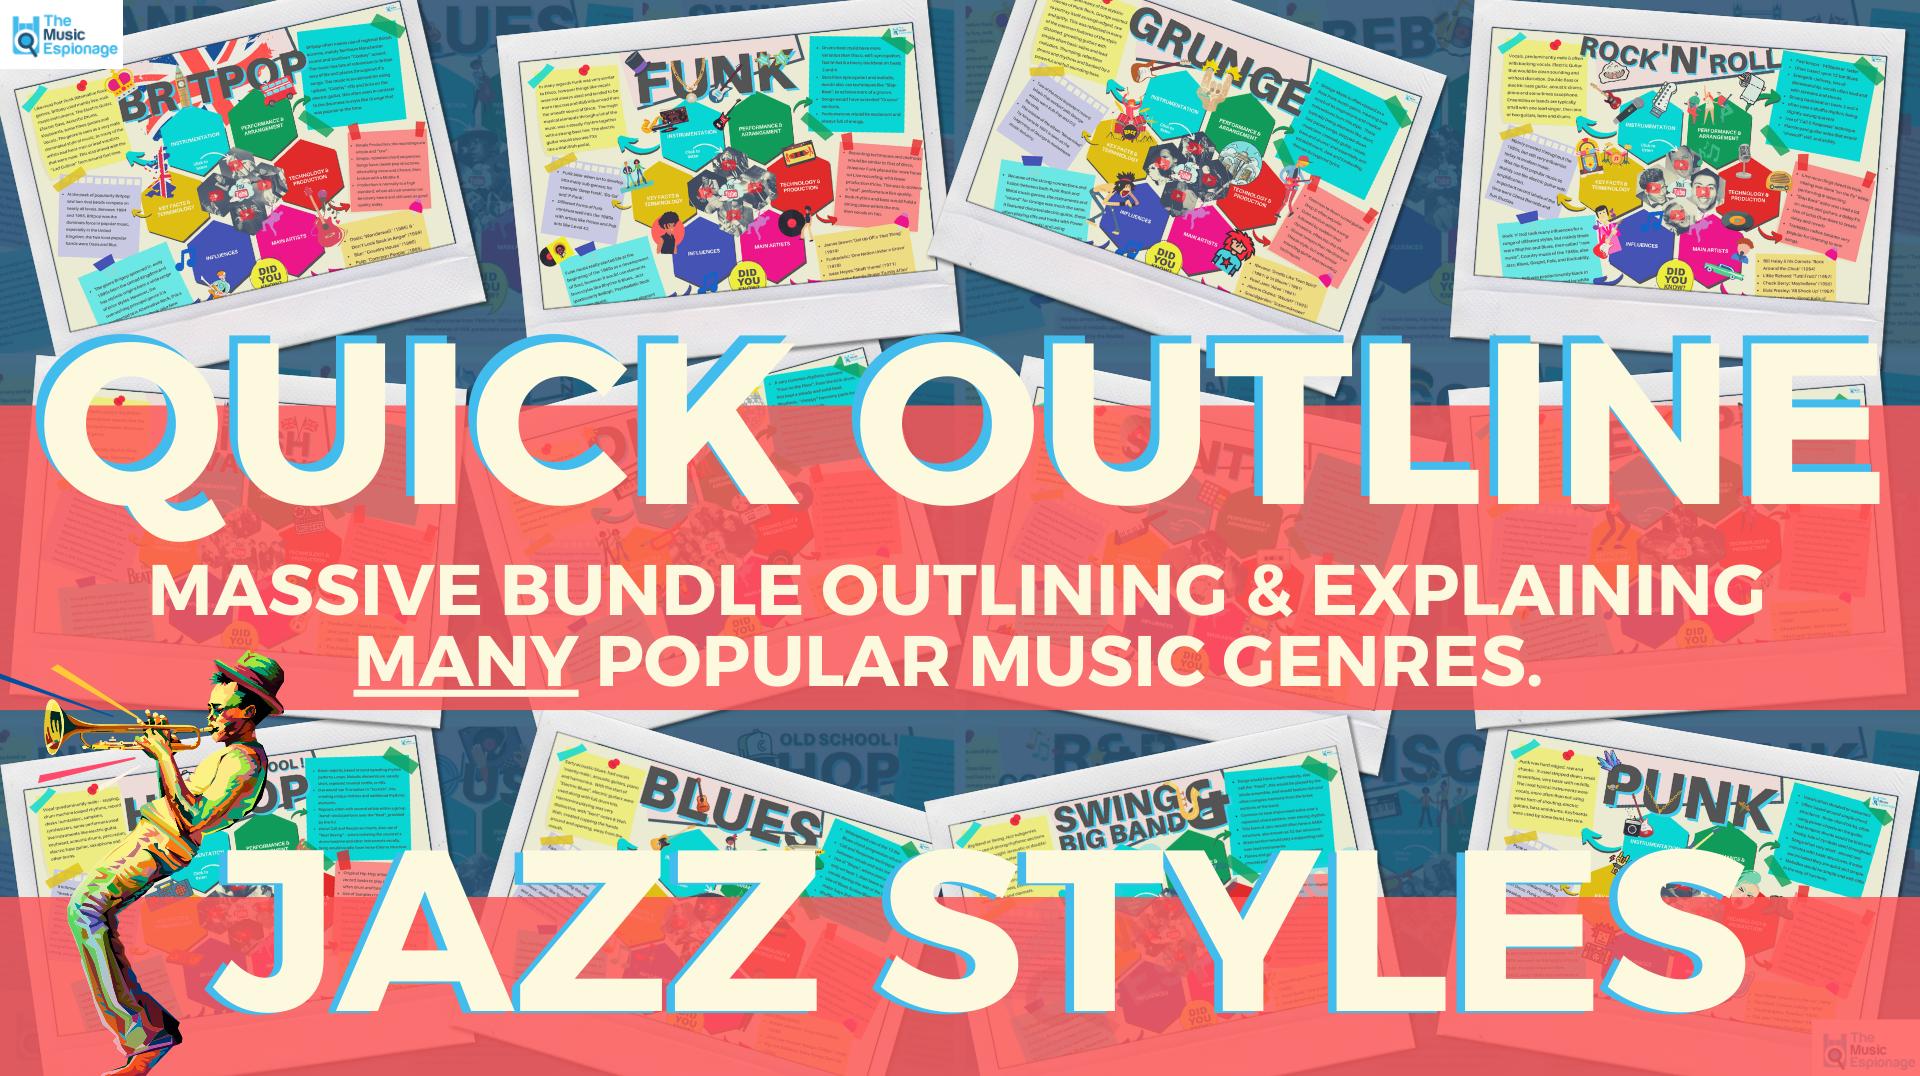 Music Genres Quick Outline-MEGA BUNDLE-Jazz Styles